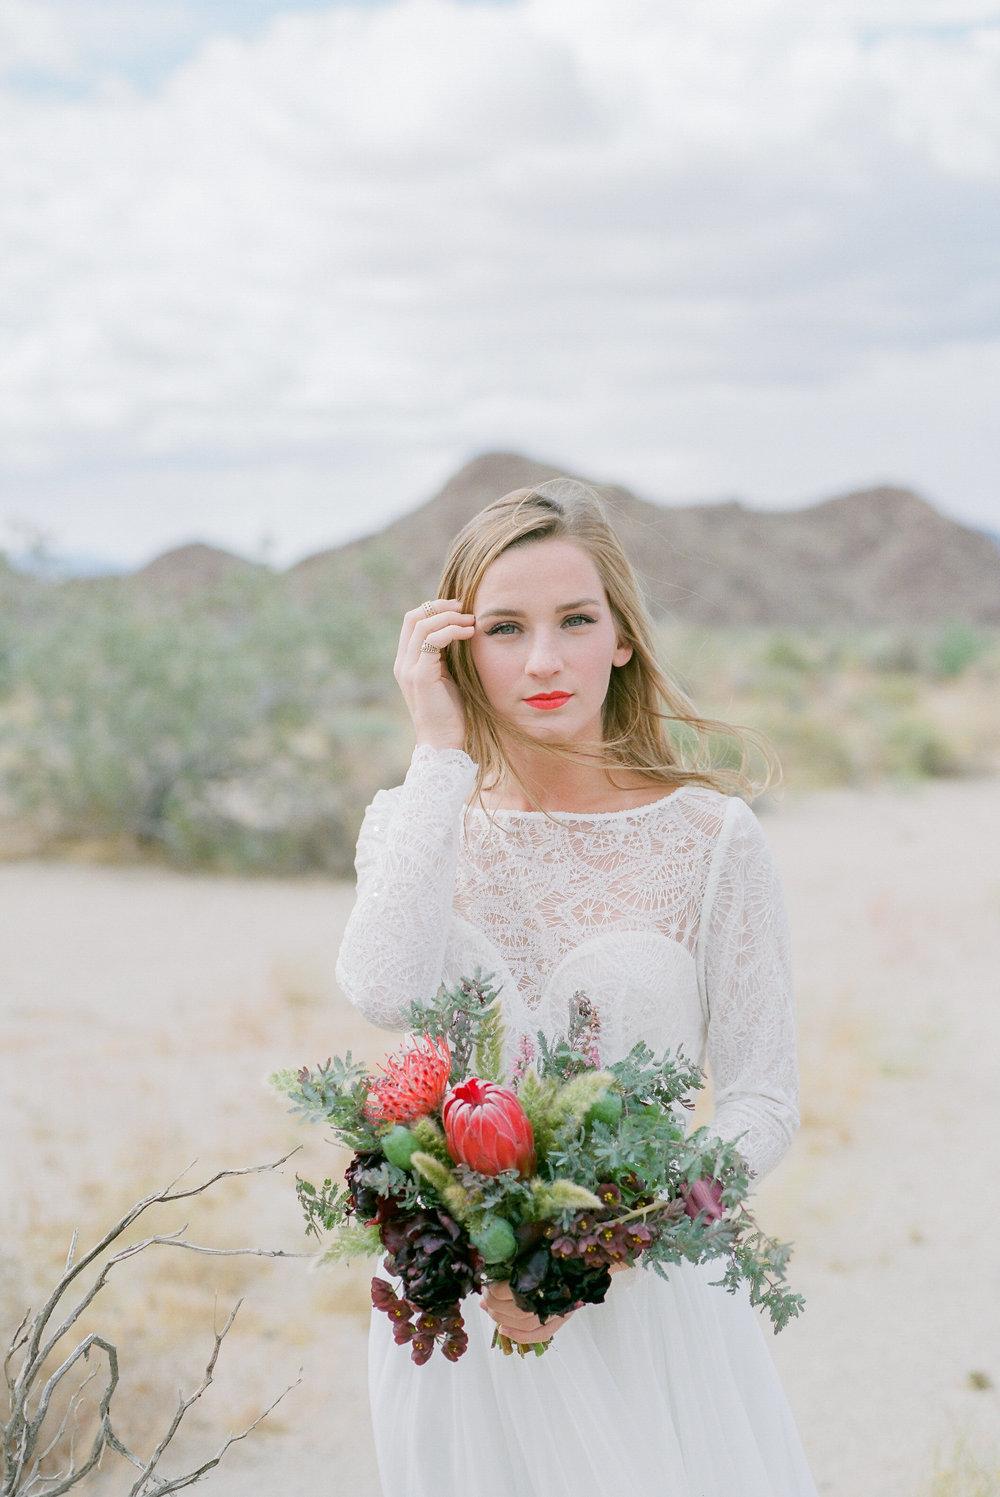 Lake Tahoe Weddings, Lake Tahoe Elopements, Engagements, e-session, destination wedding photographer, weddings, couples, engagements